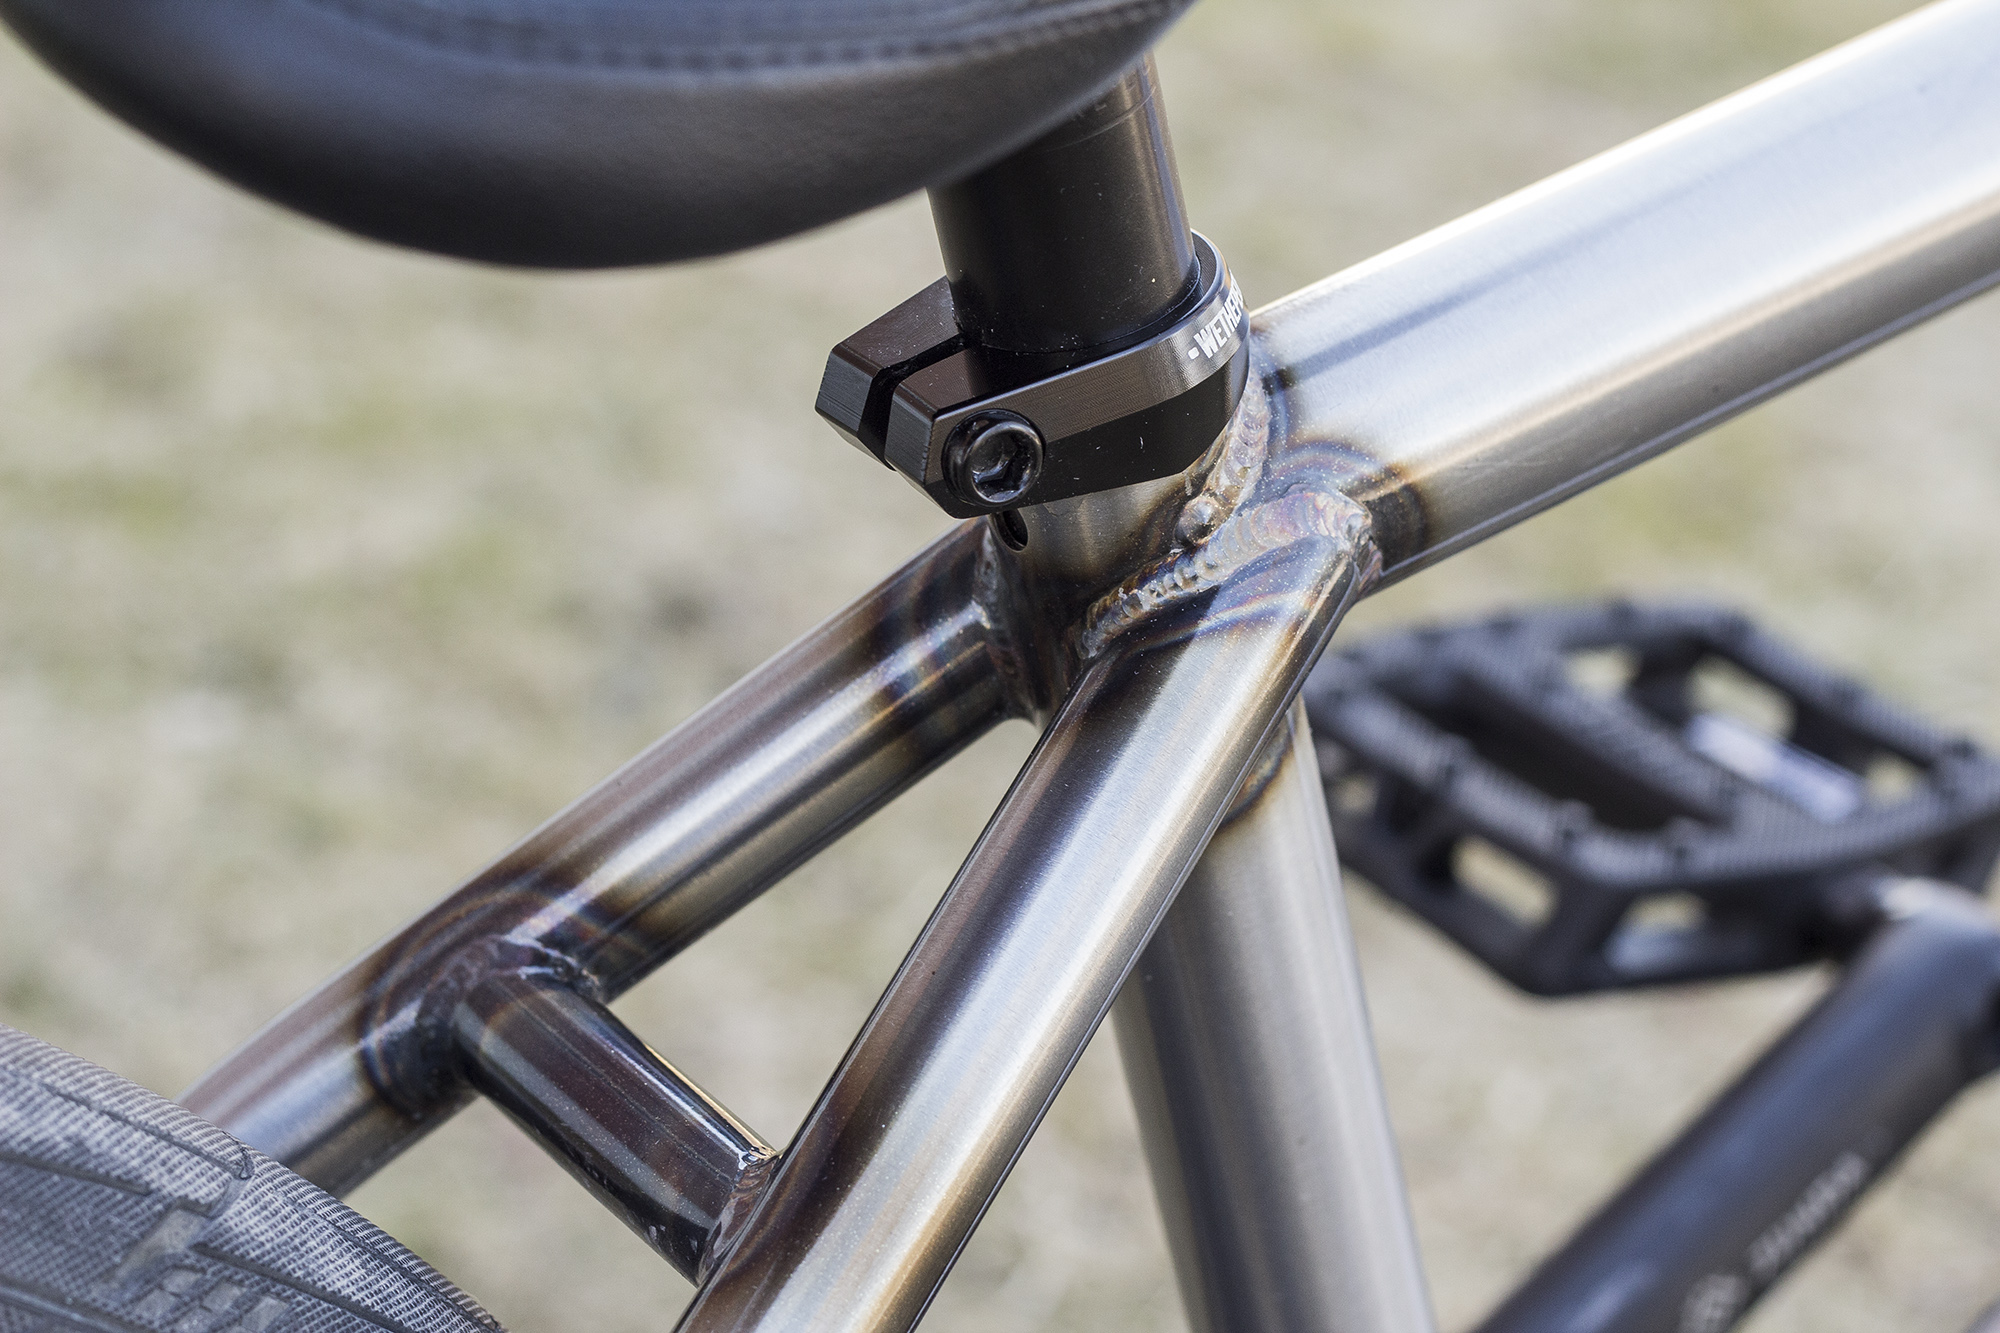 Mike_Revolver_bikecheck_detail_06.jpg